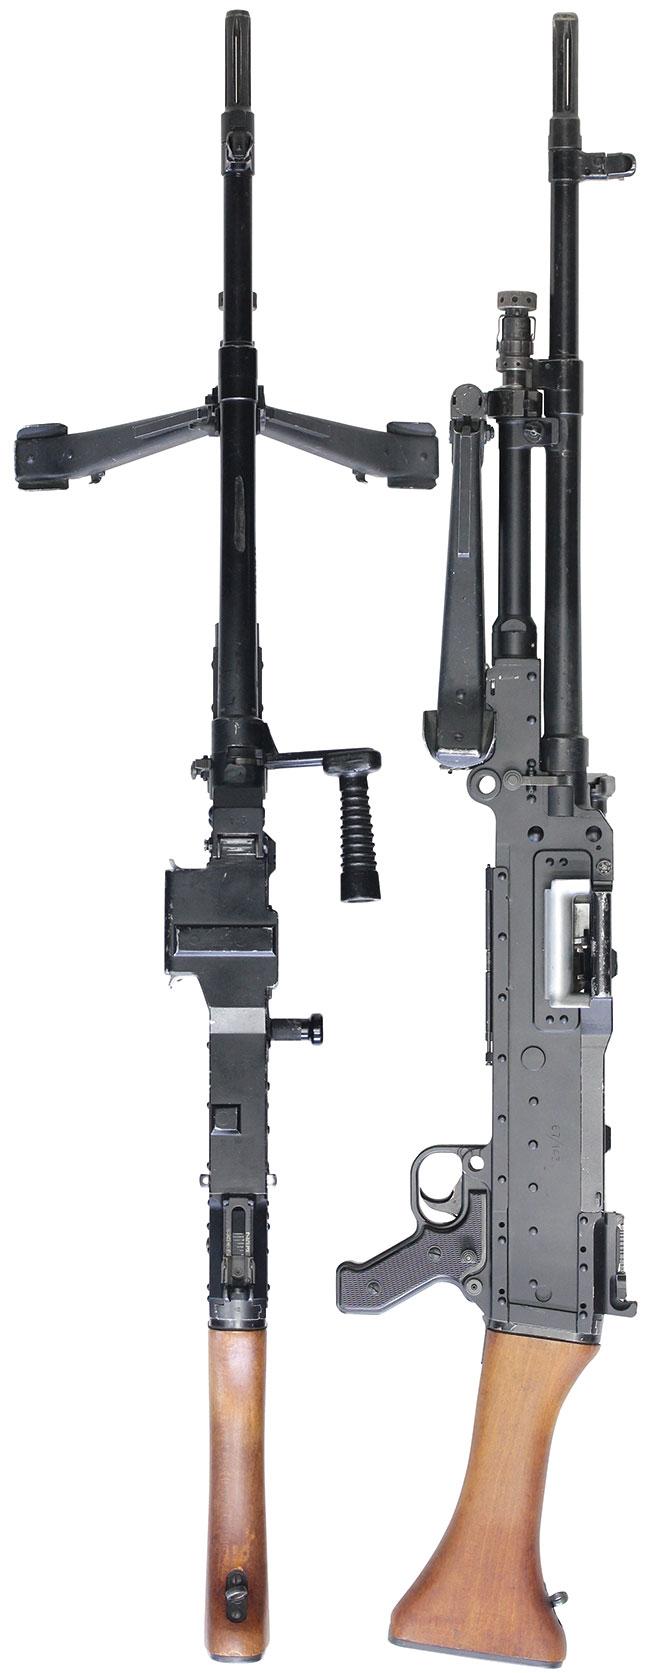 【2406】FN-MAG-汎用機関銃-(#143)---左.jpg